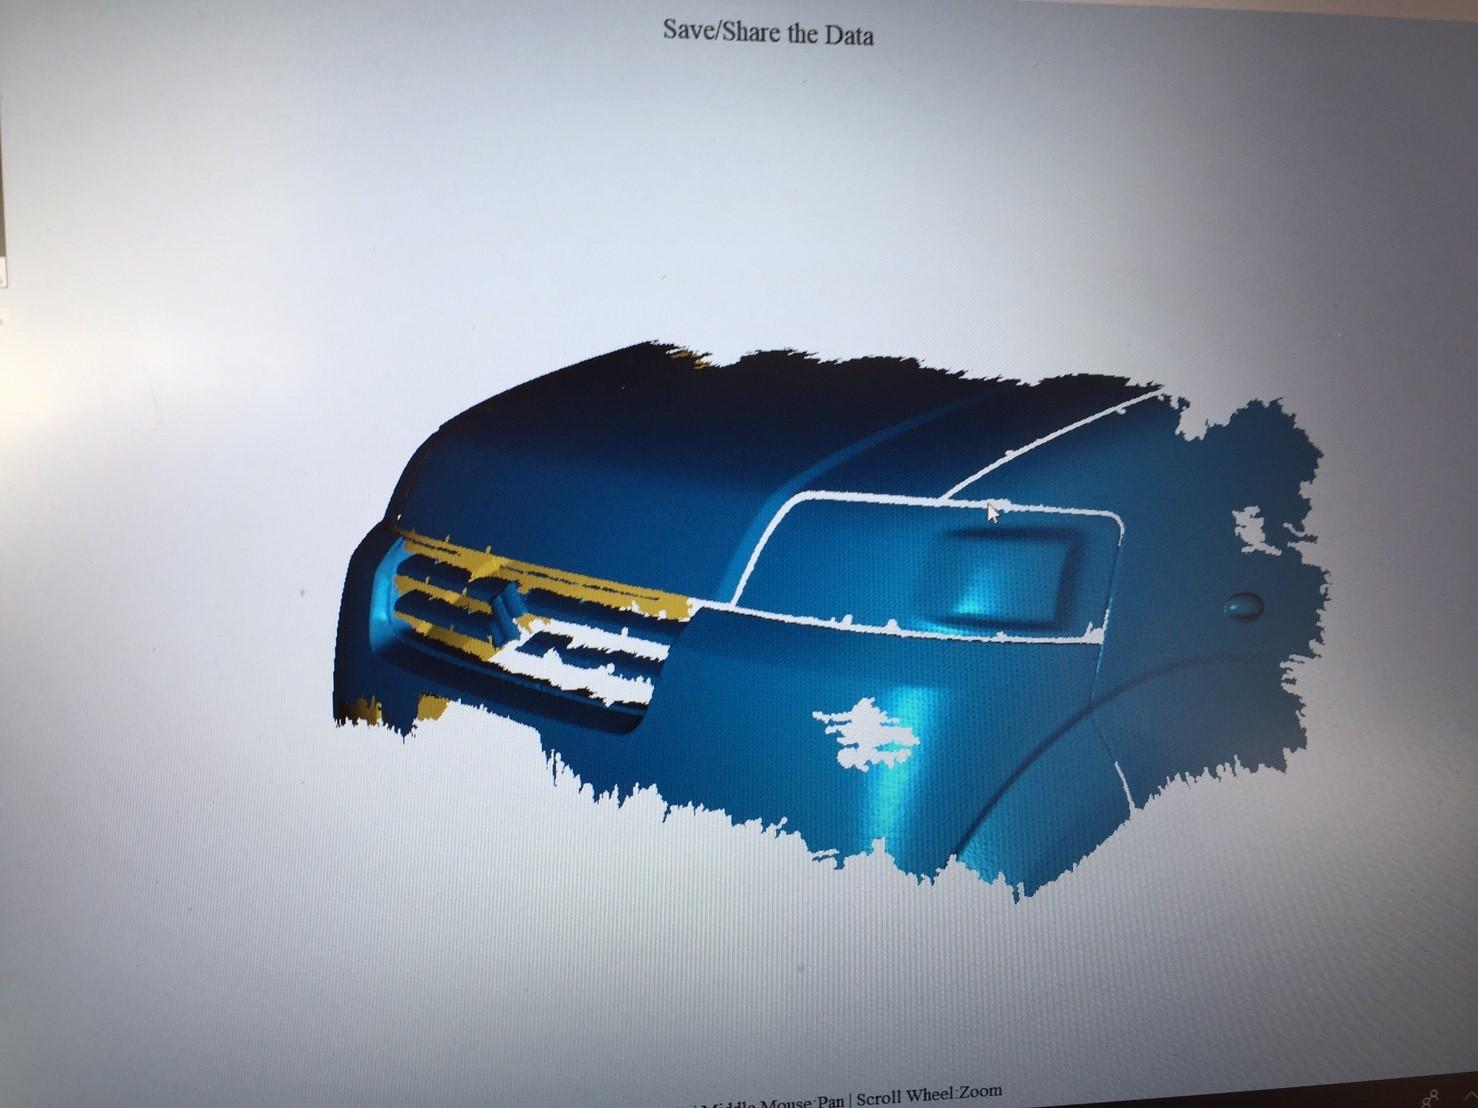 3D Scan รถยนต์ ส่วนประกอบรถยนต์ ด้วย EinScanPro